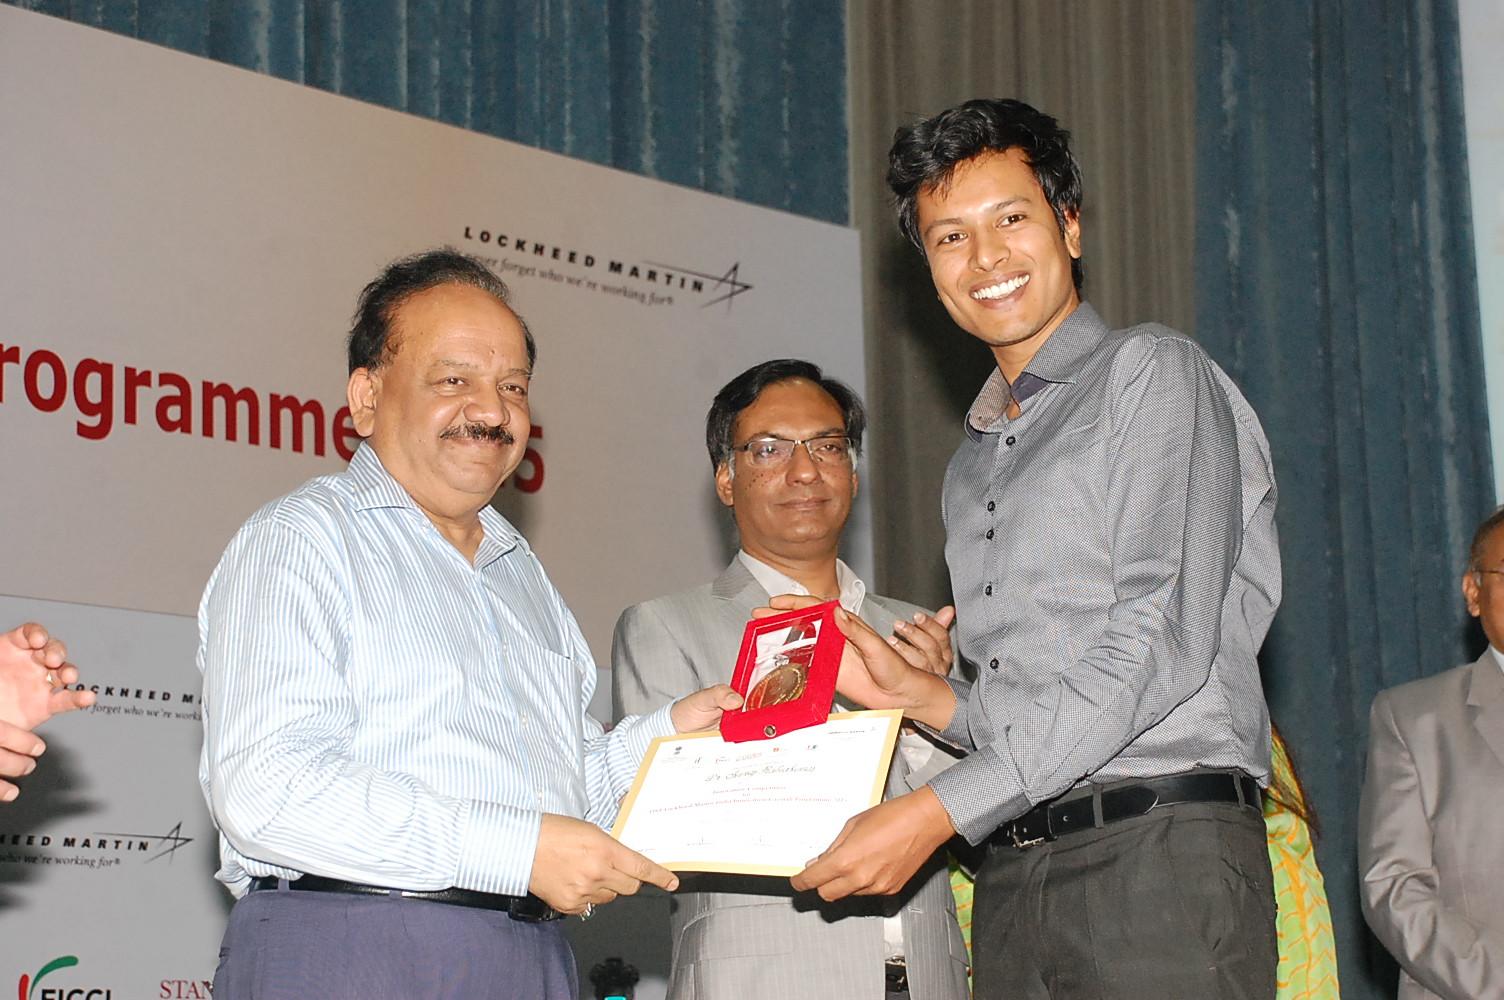 Dr Sooraj Ratnakumar, Swagene's Founder-Scientist, receives the award from Dr Harsh Vardhan